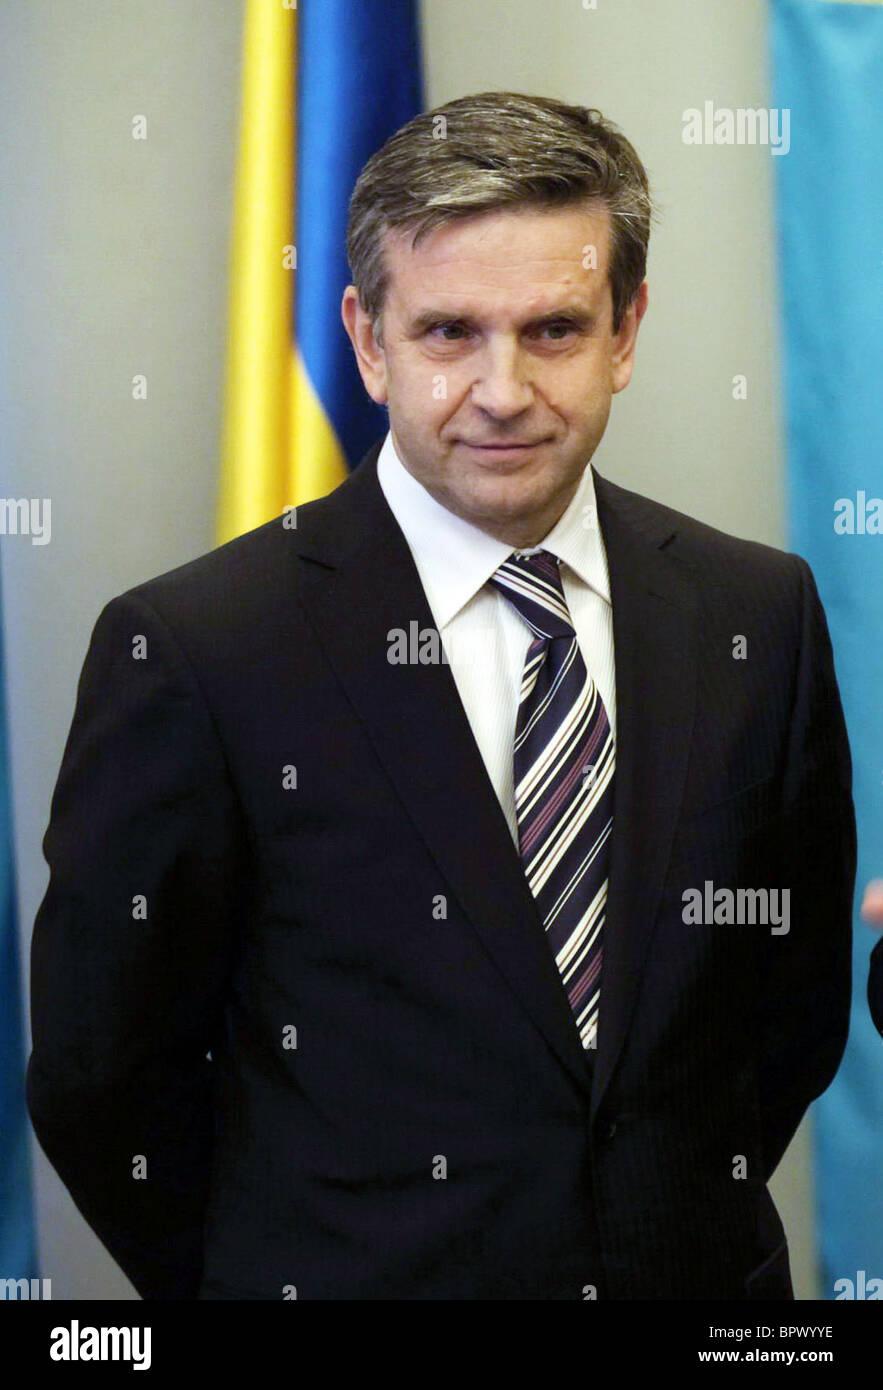 Russia's new ambassador Zurabov presents credentials to Ukraine foreign minister - Stock Image